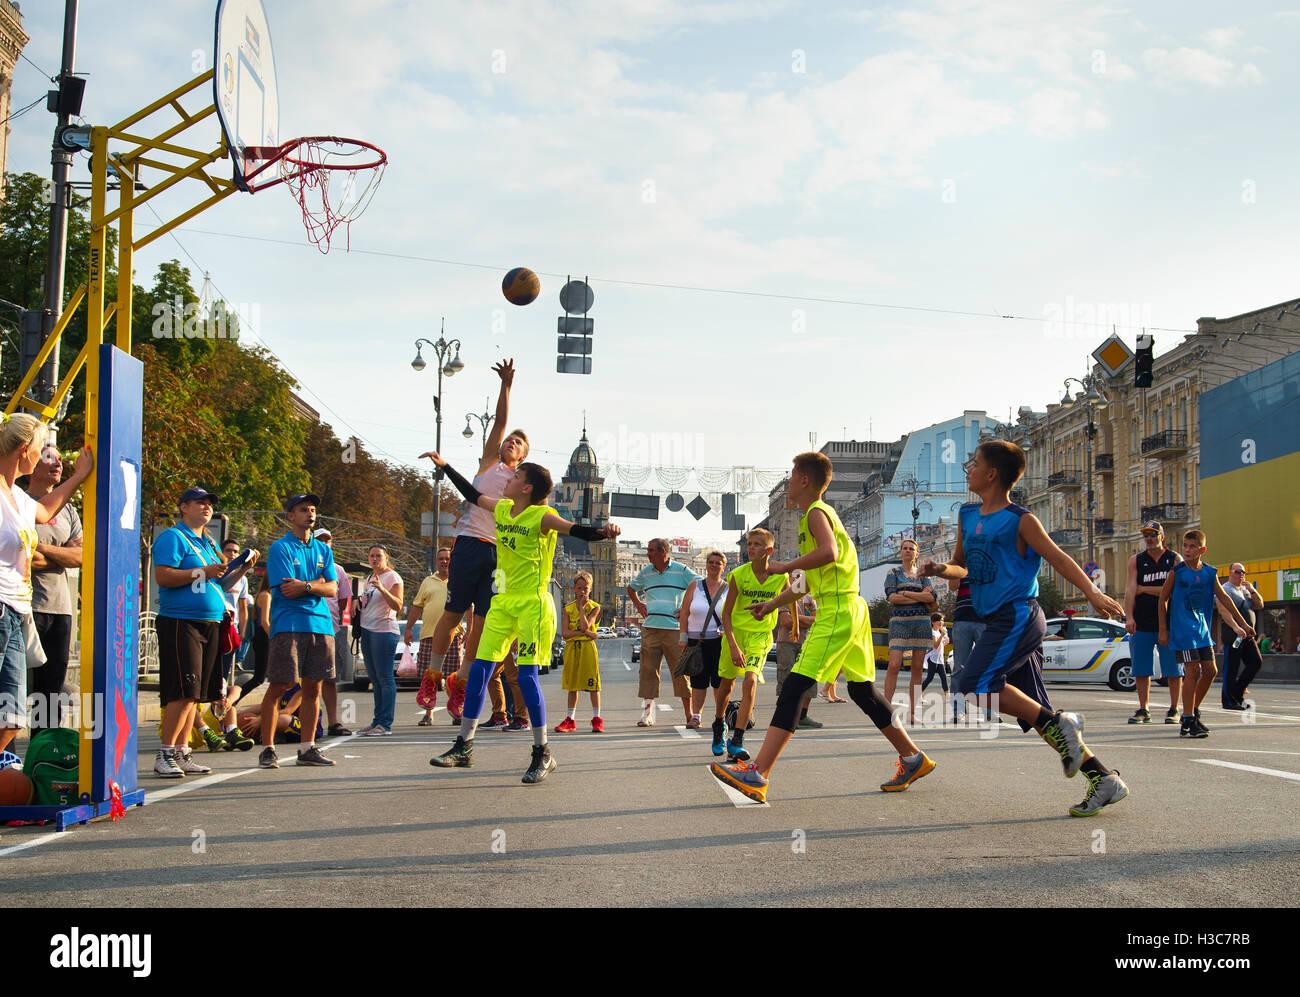 Teenagers playing basketball during the 3x3 Ukrainian Streetball Championship. - Stock Image